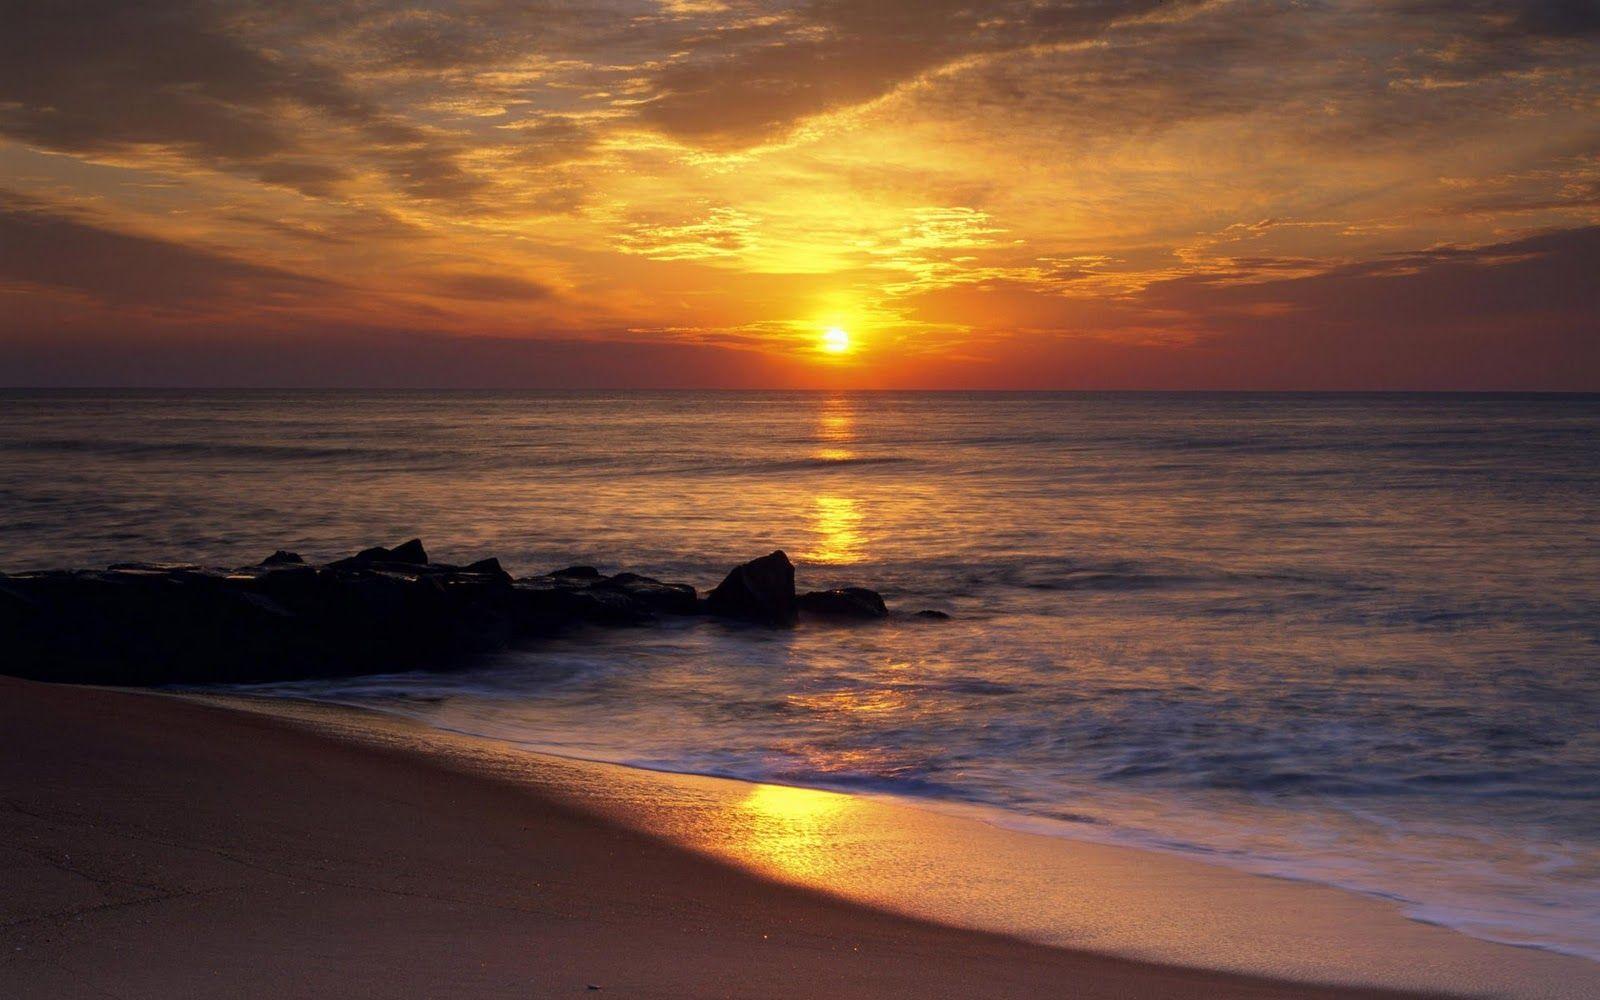 Gambar Matahari Terbenam Di Laut